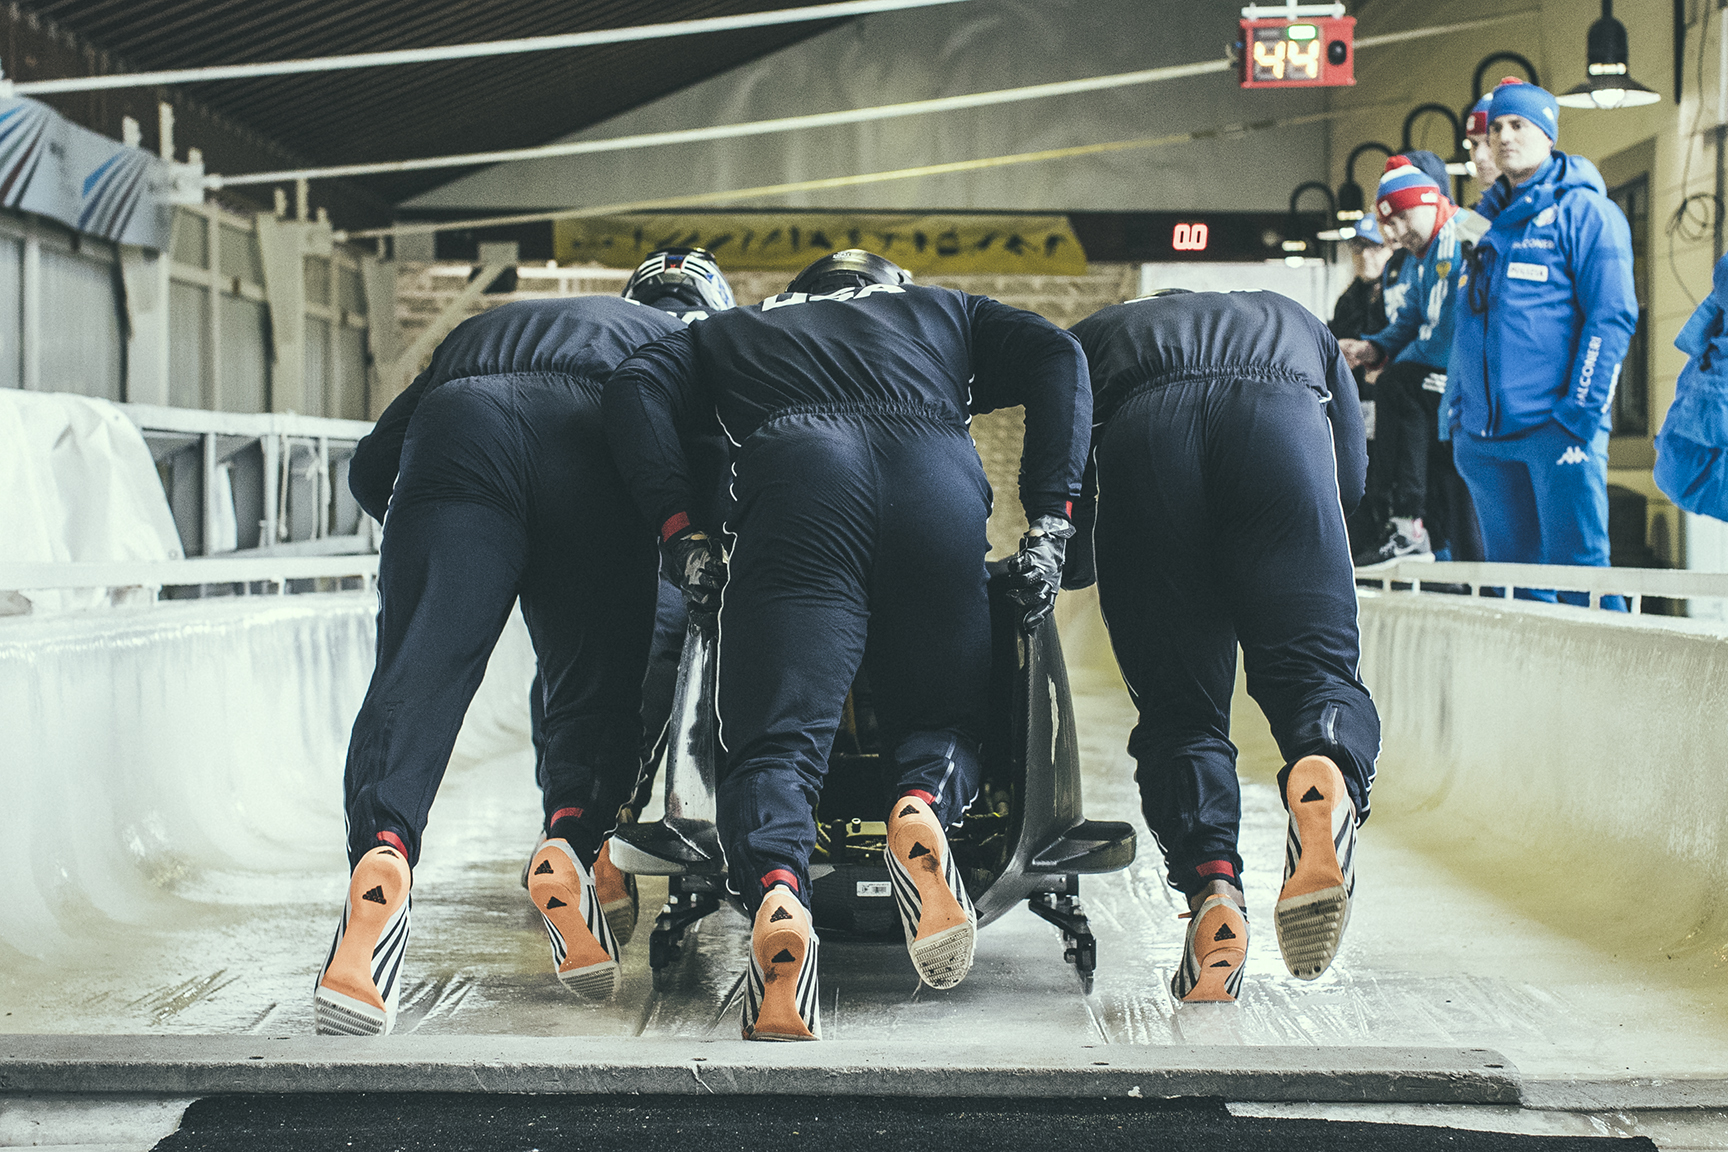 USA Bobsledding Team